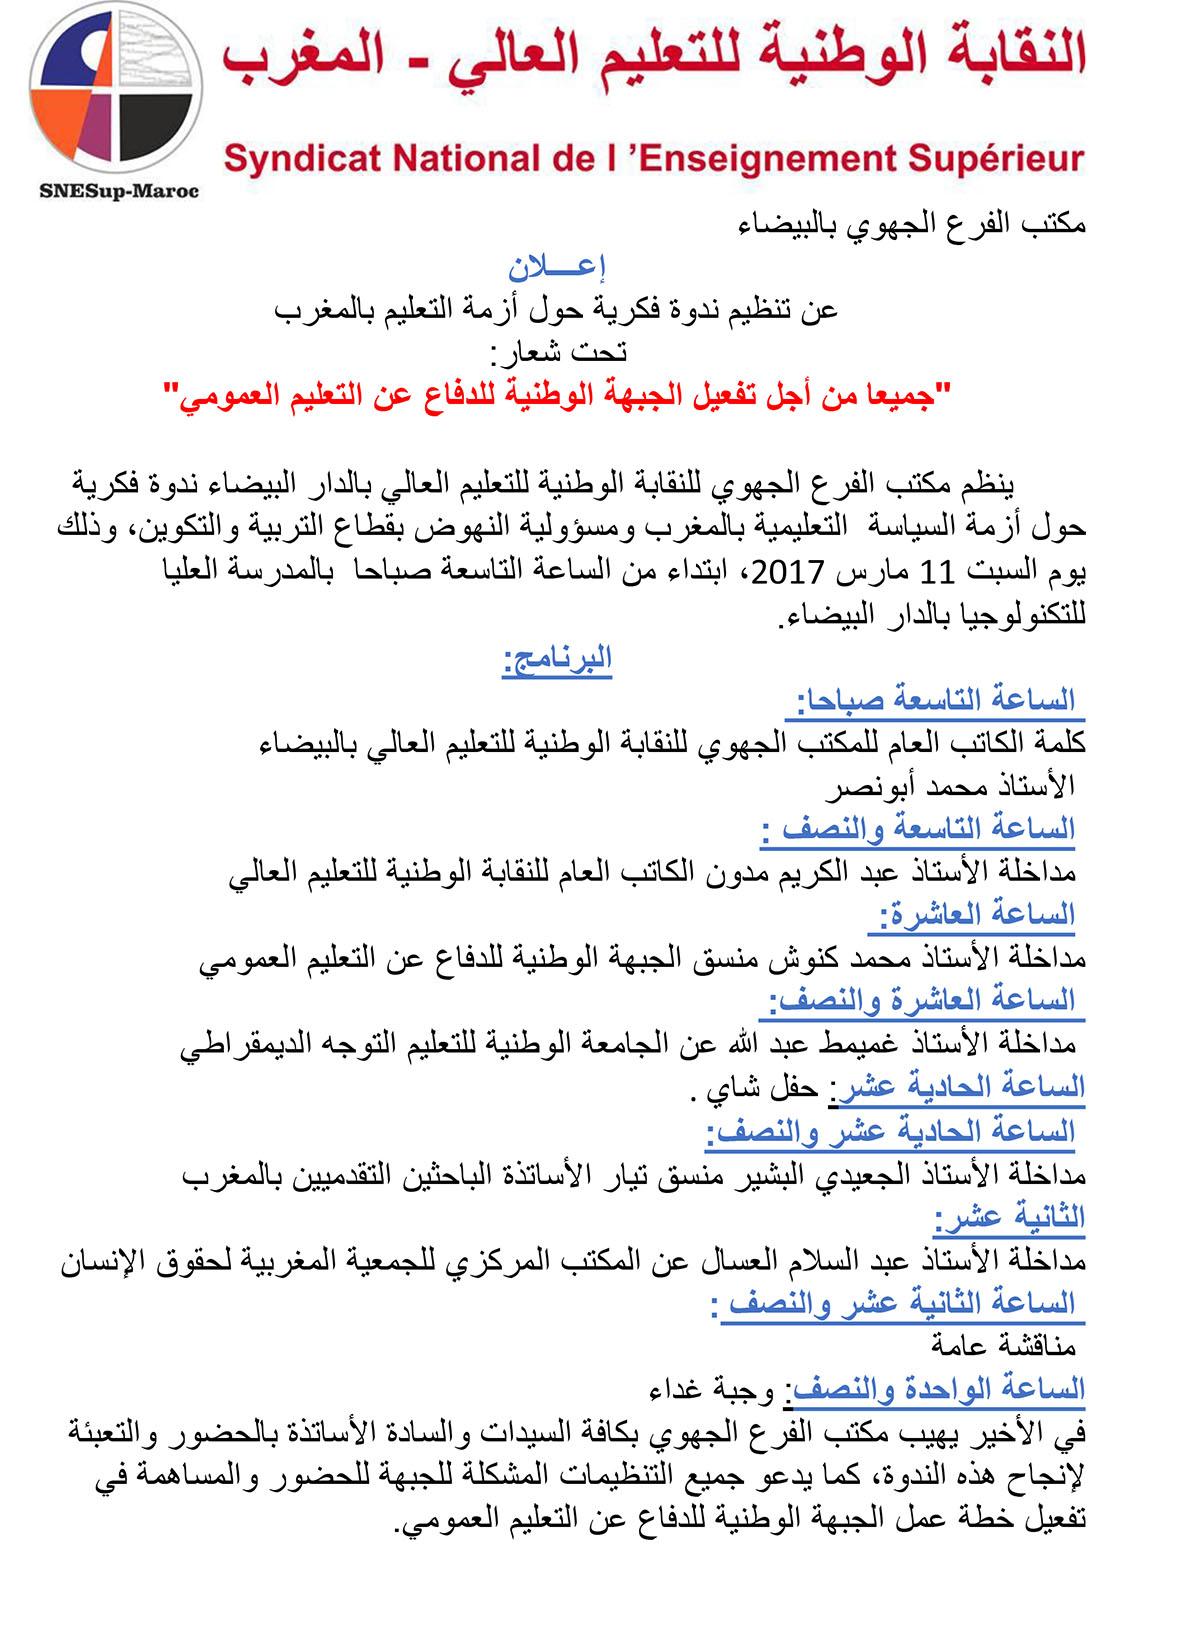 Snesup-conference-enseignement-EST-Casa-11-3-2017-Bounasr-Madoun-Qnouch-Ghmimat-Jaaydi-Assal